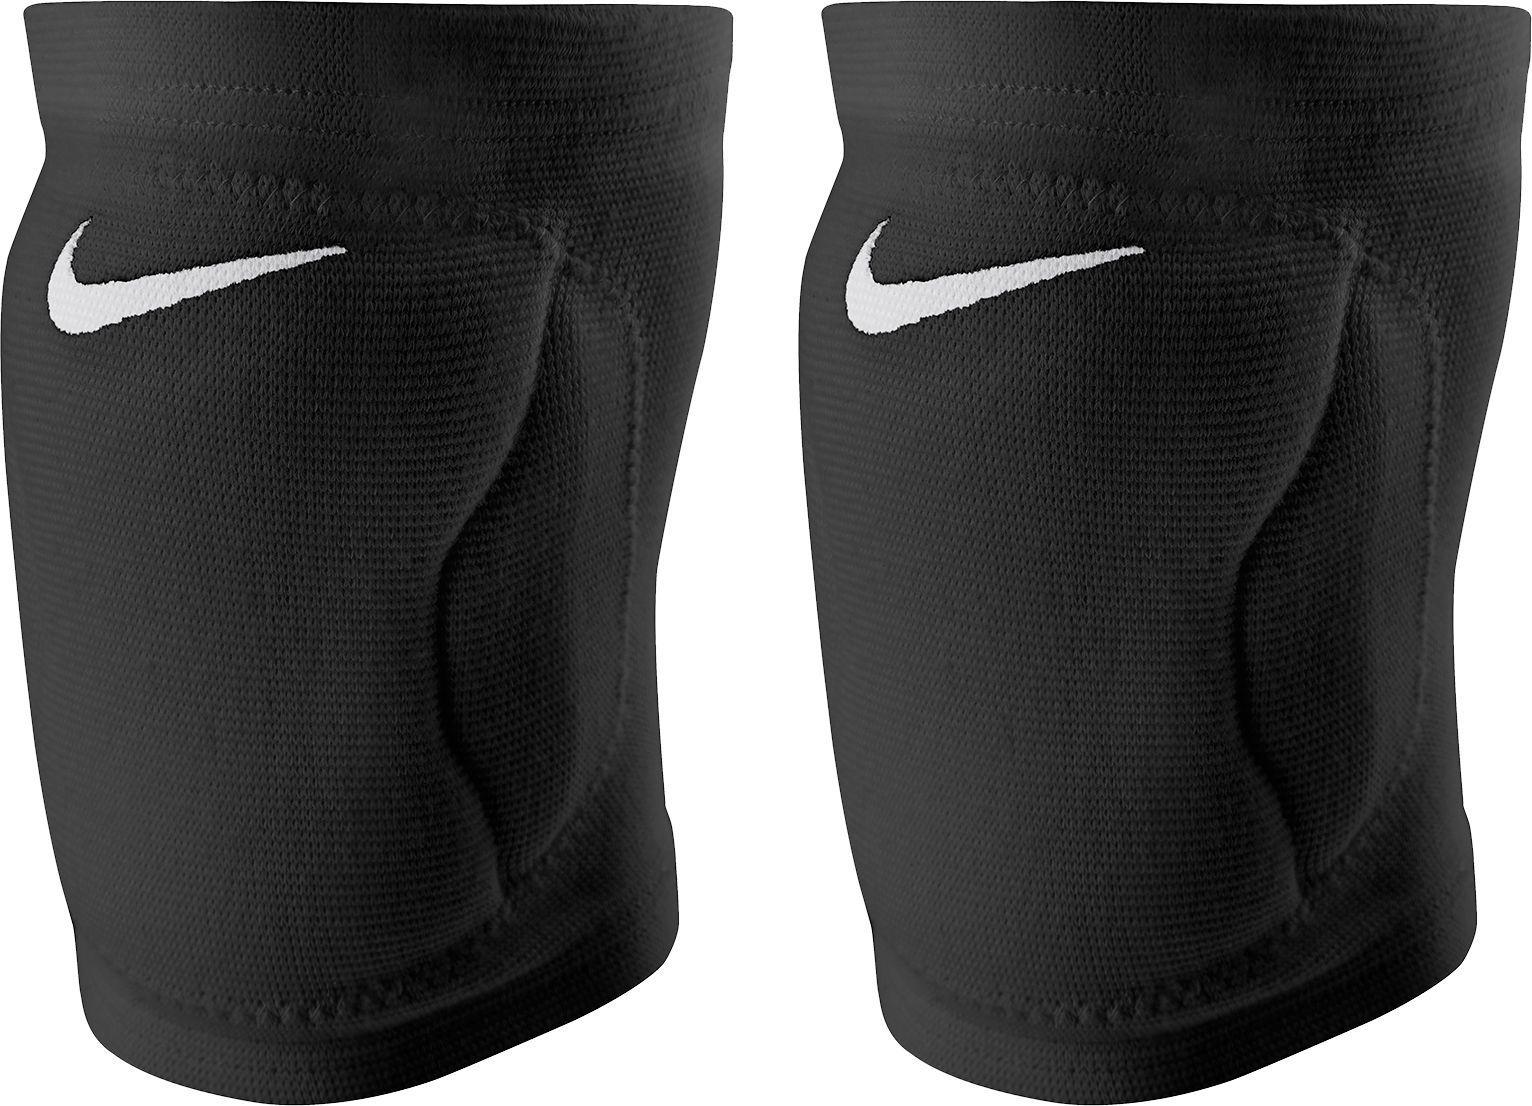 Nike Youth Streak Volleyball Knee Pads Black In 2020 Volleyball Outfits Volleyball Knee Pads Nike Volleyball